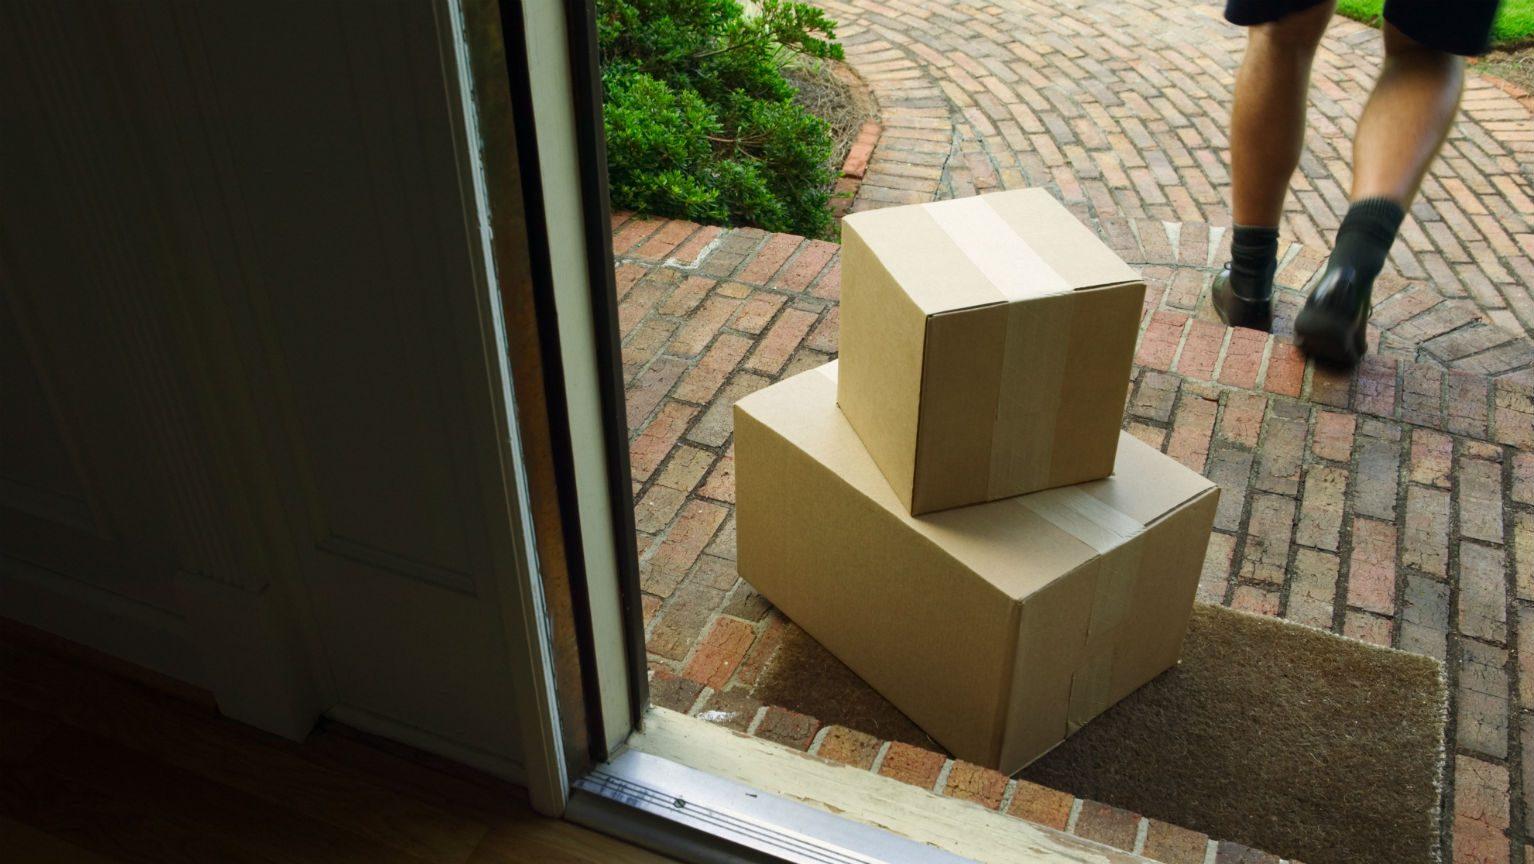 Cardboard boxes left on doorstep